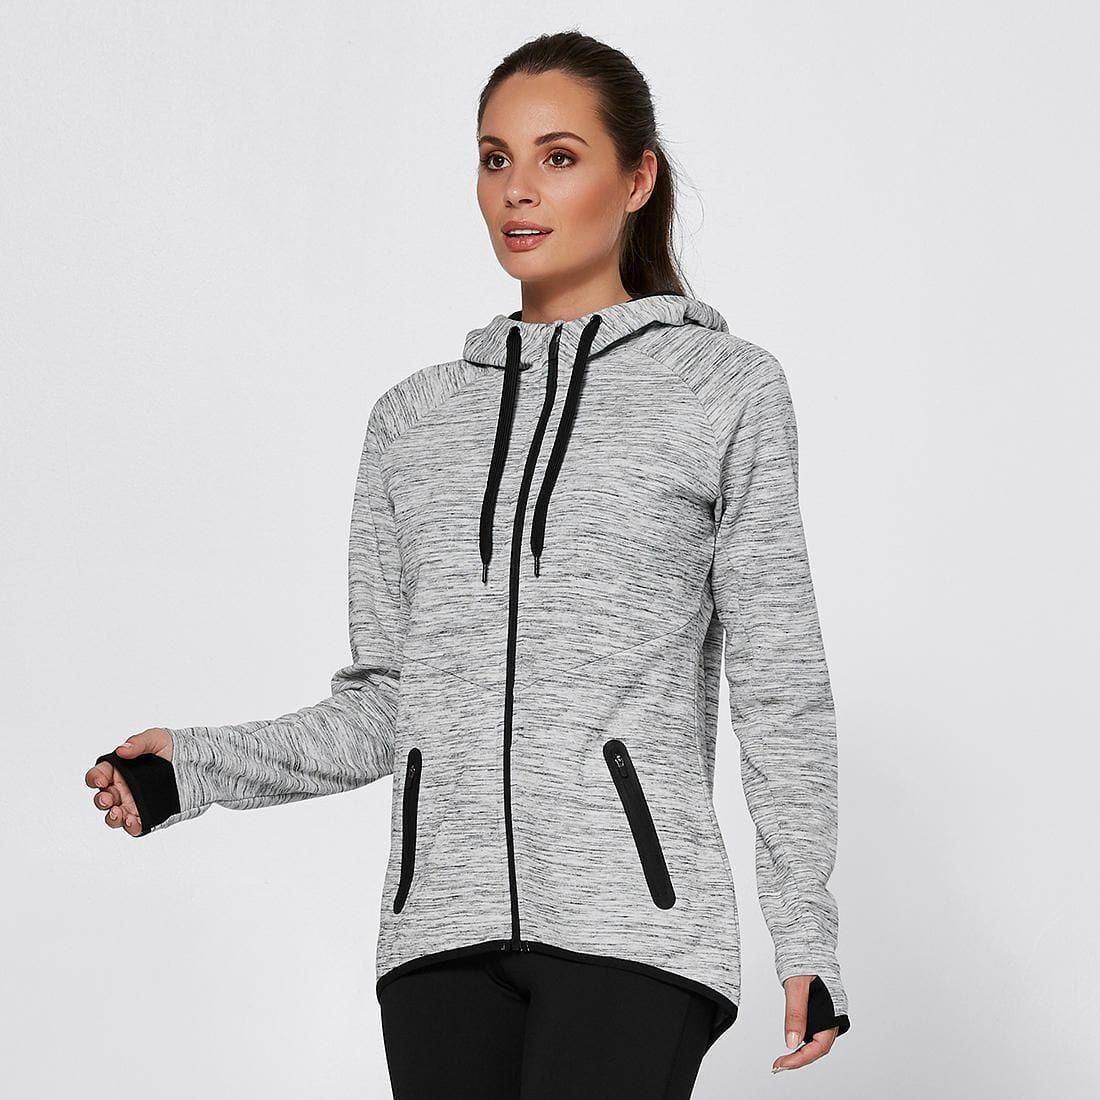 Active Tech Fleece Jacket Light Grey Marle Tech fleece